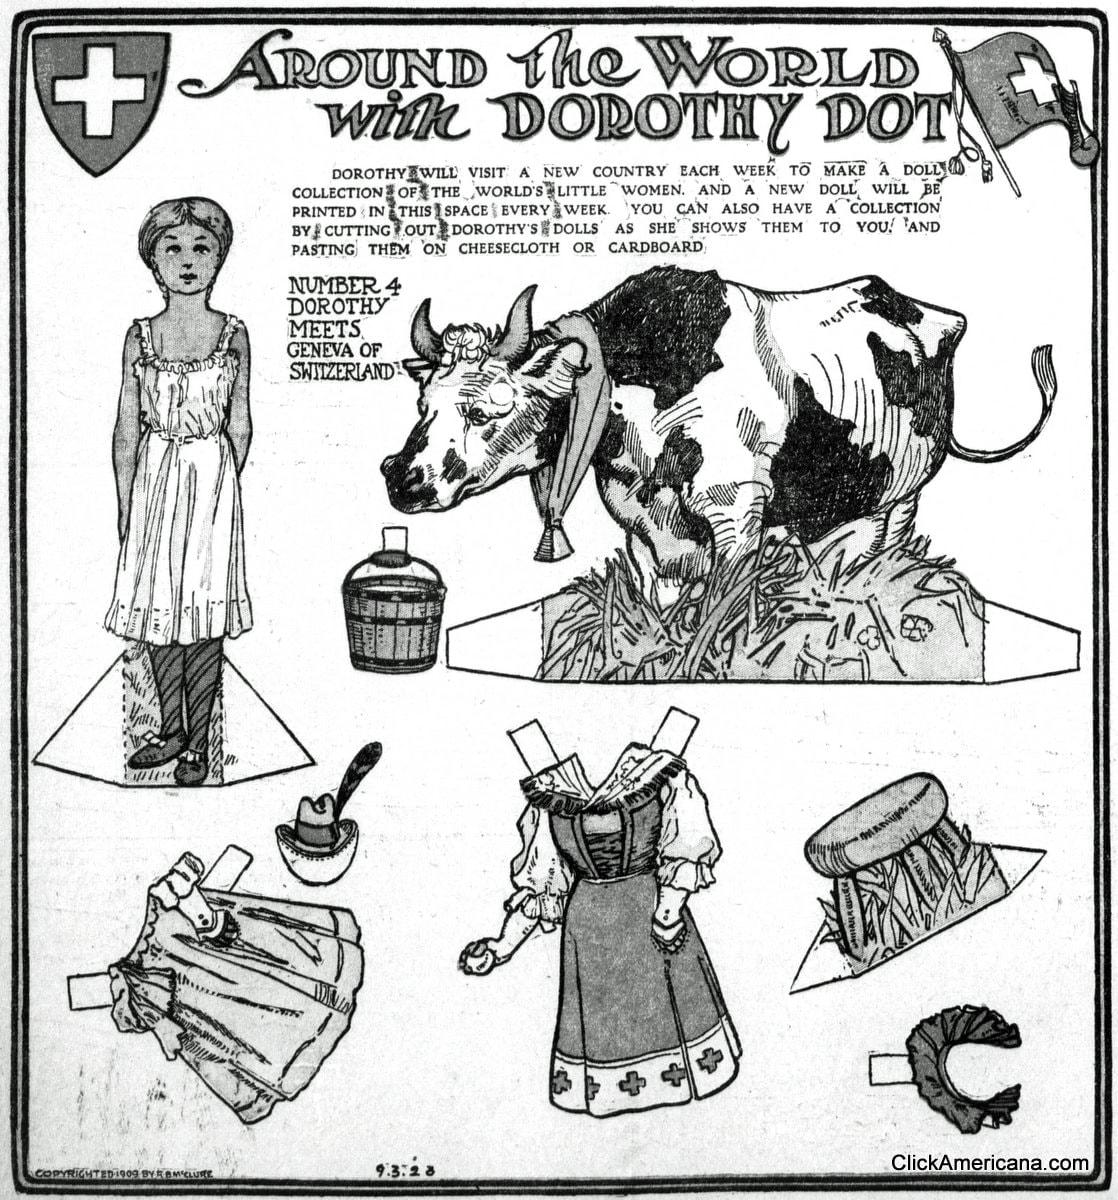 Dorothy Dot paper doll: Geneva of Switzerland (1909)